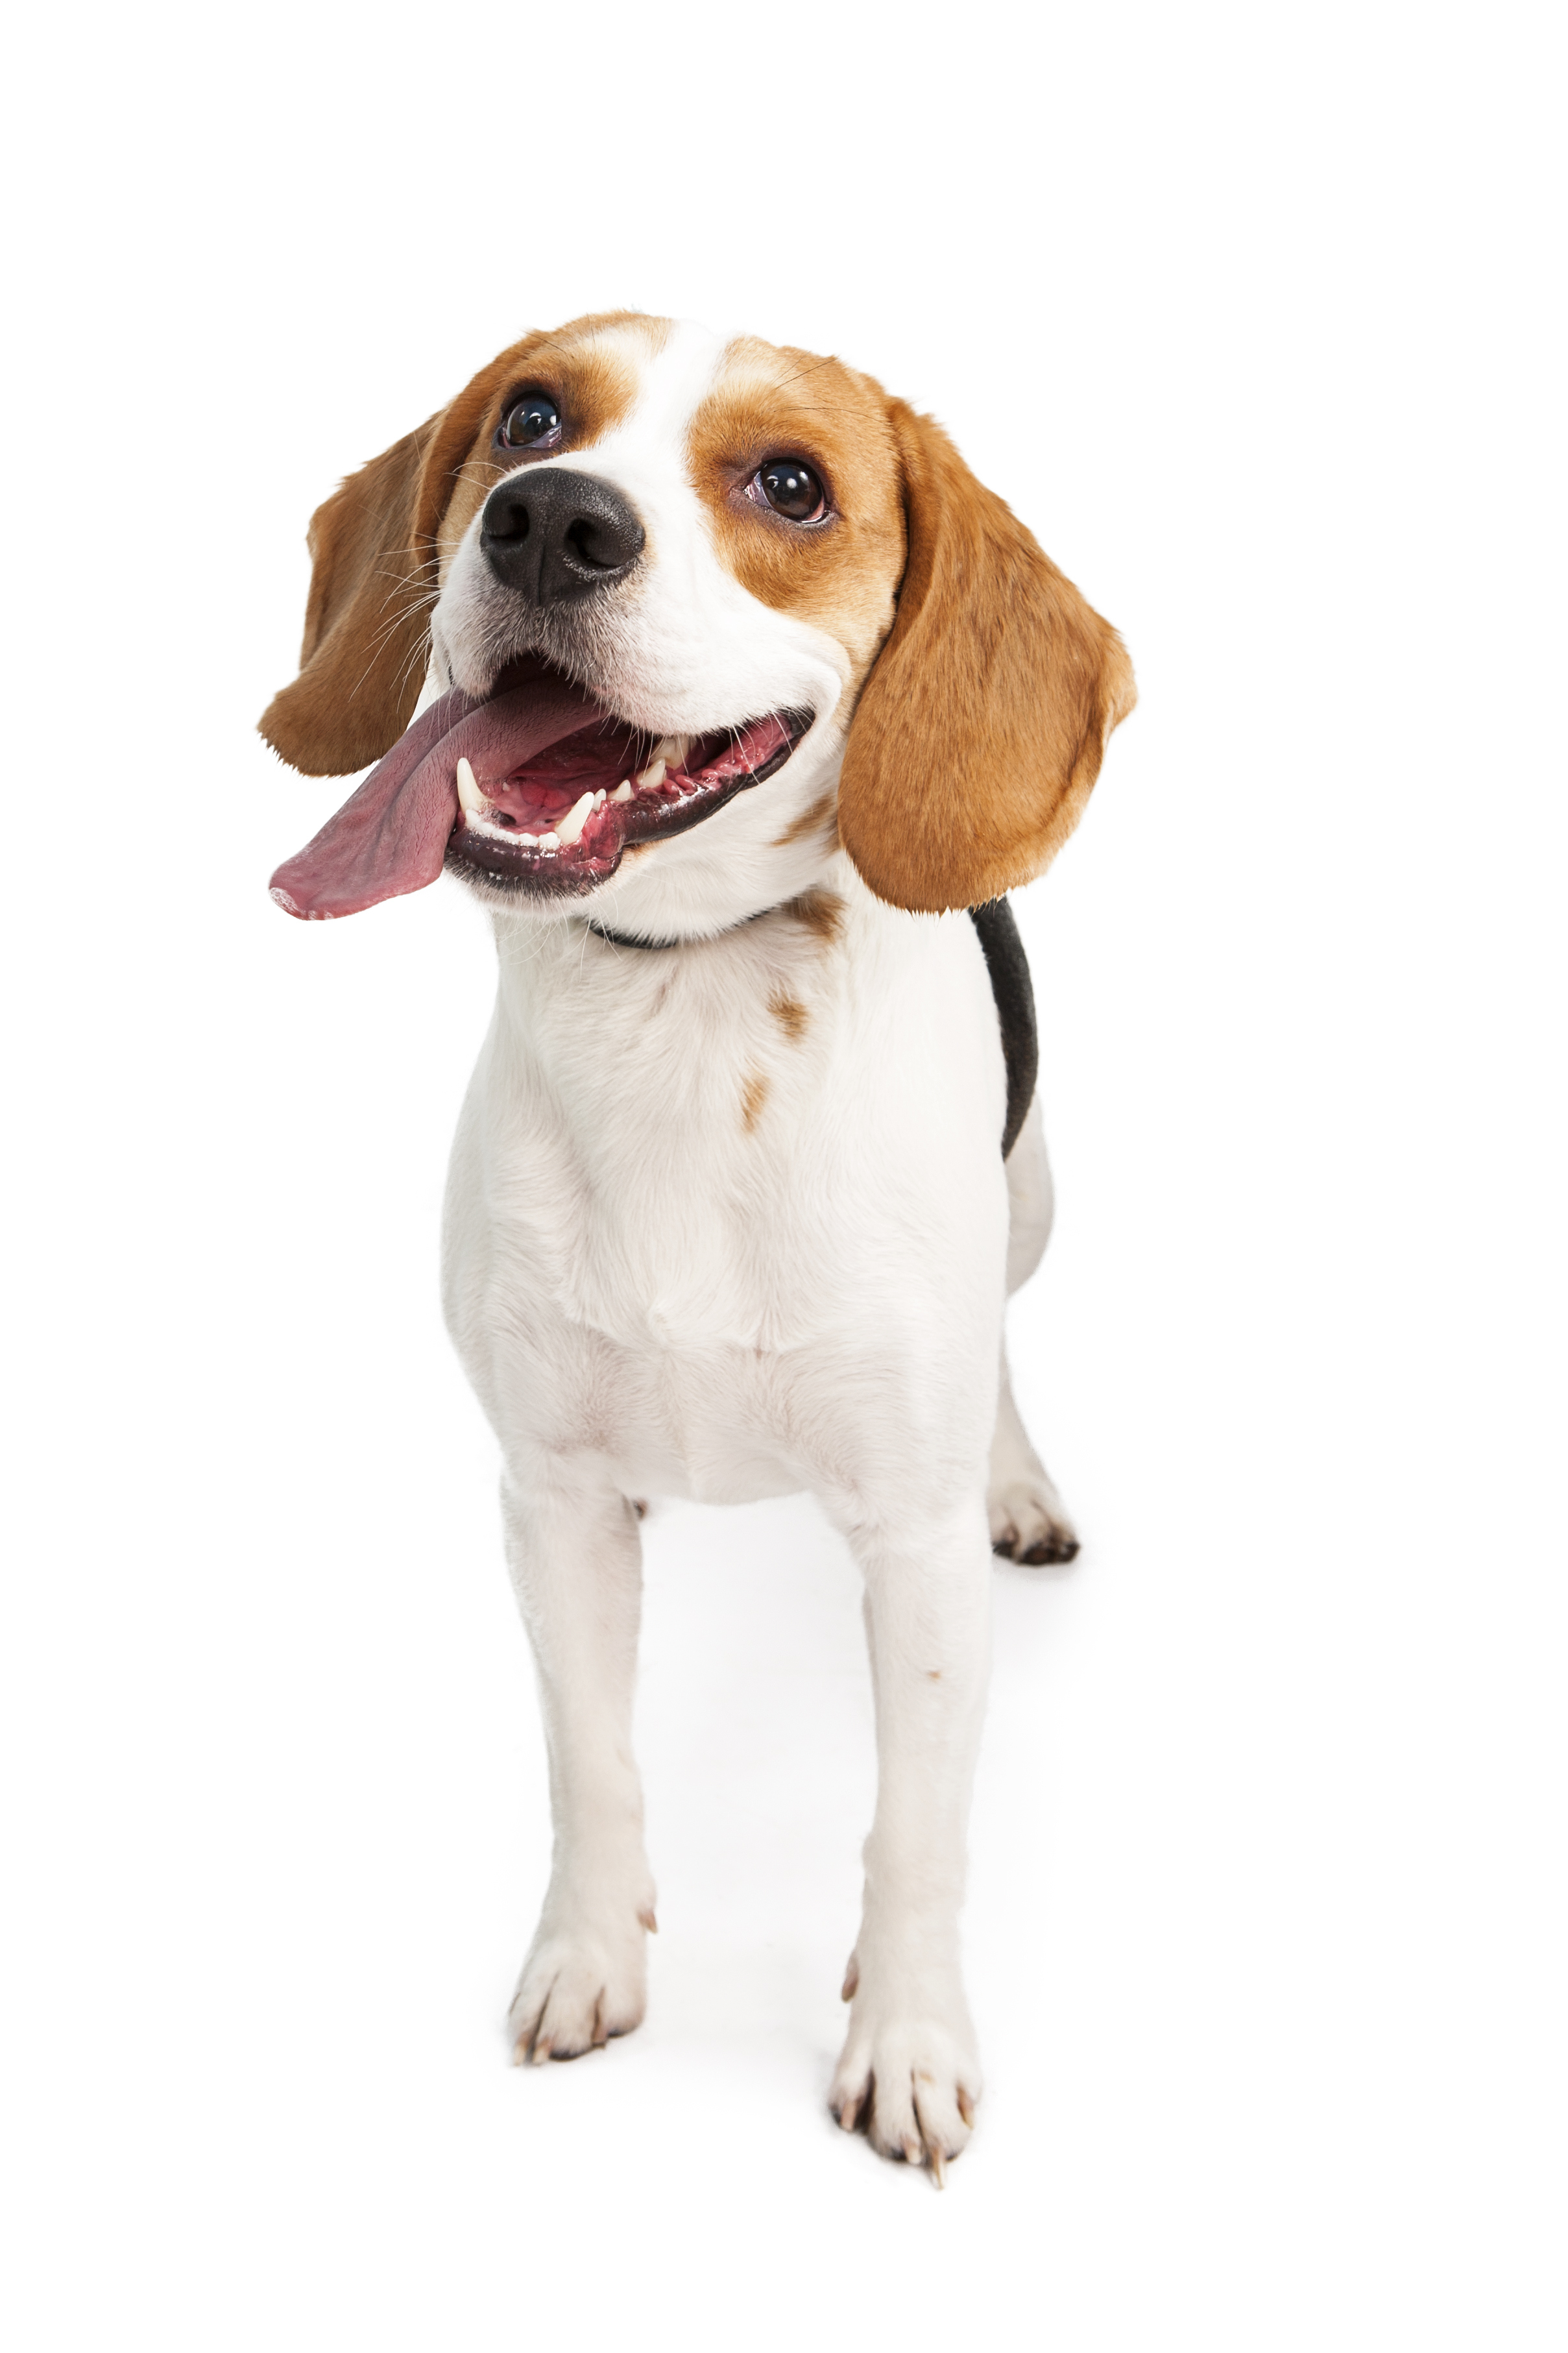 Hiring dog walker jobs in orange county, pet sitter, pet sitting job.